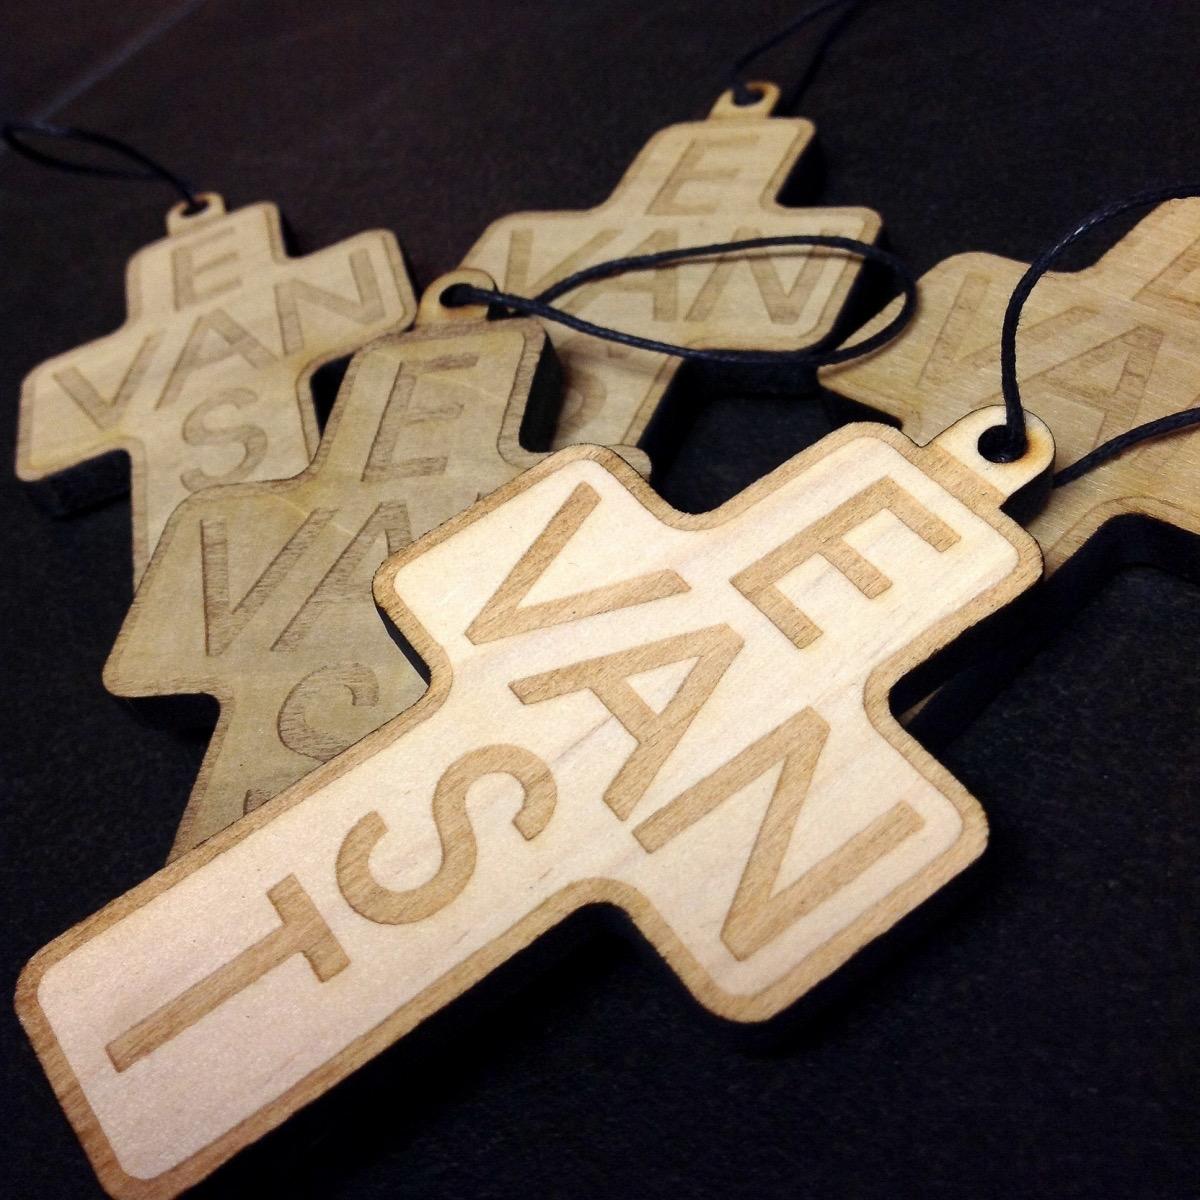 east_van_cross_wood_ornament